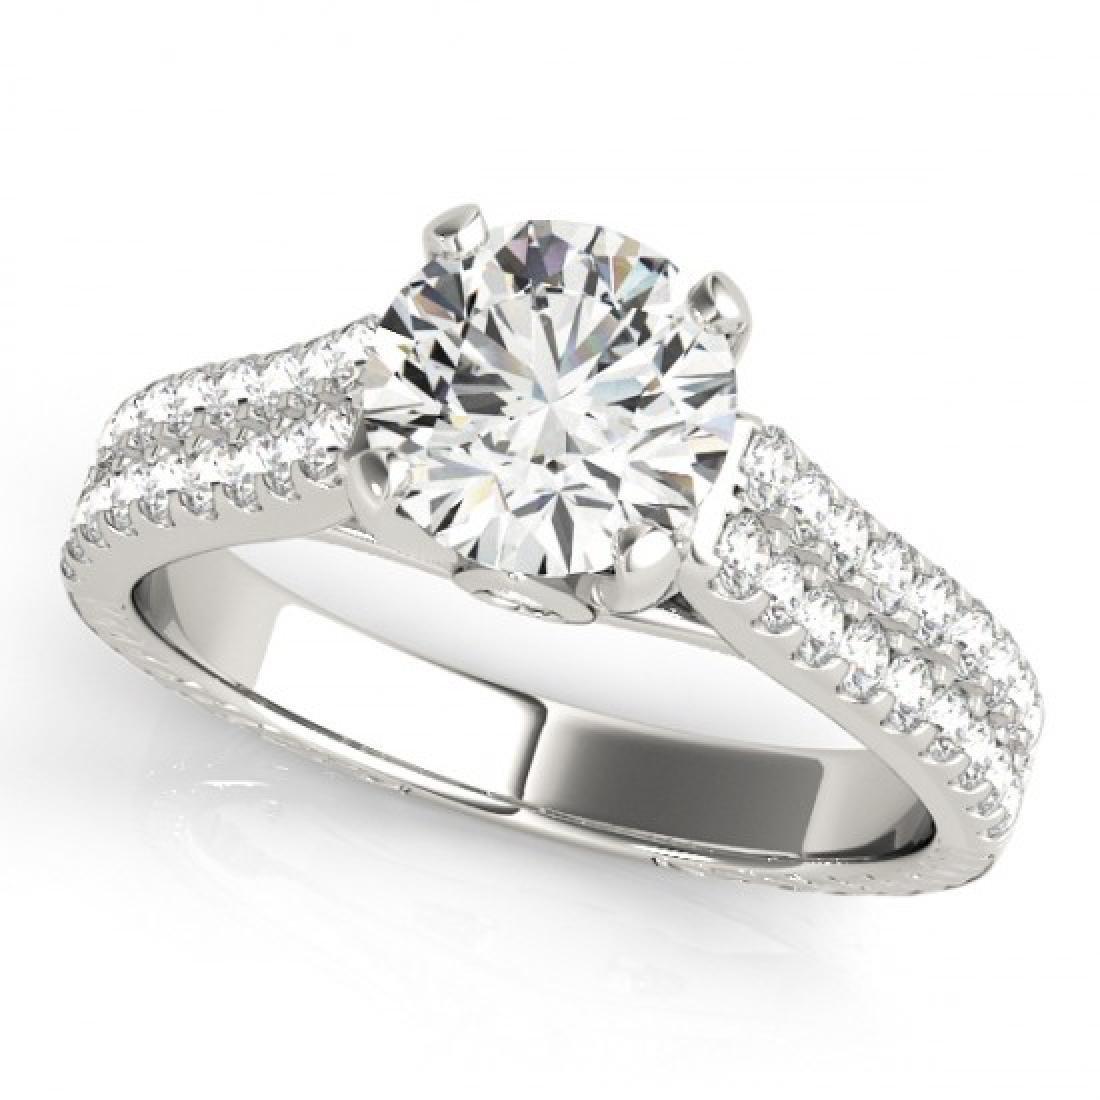 1.61 CTW Certified VS/SI Diamond Pave Ring 14K White - 2